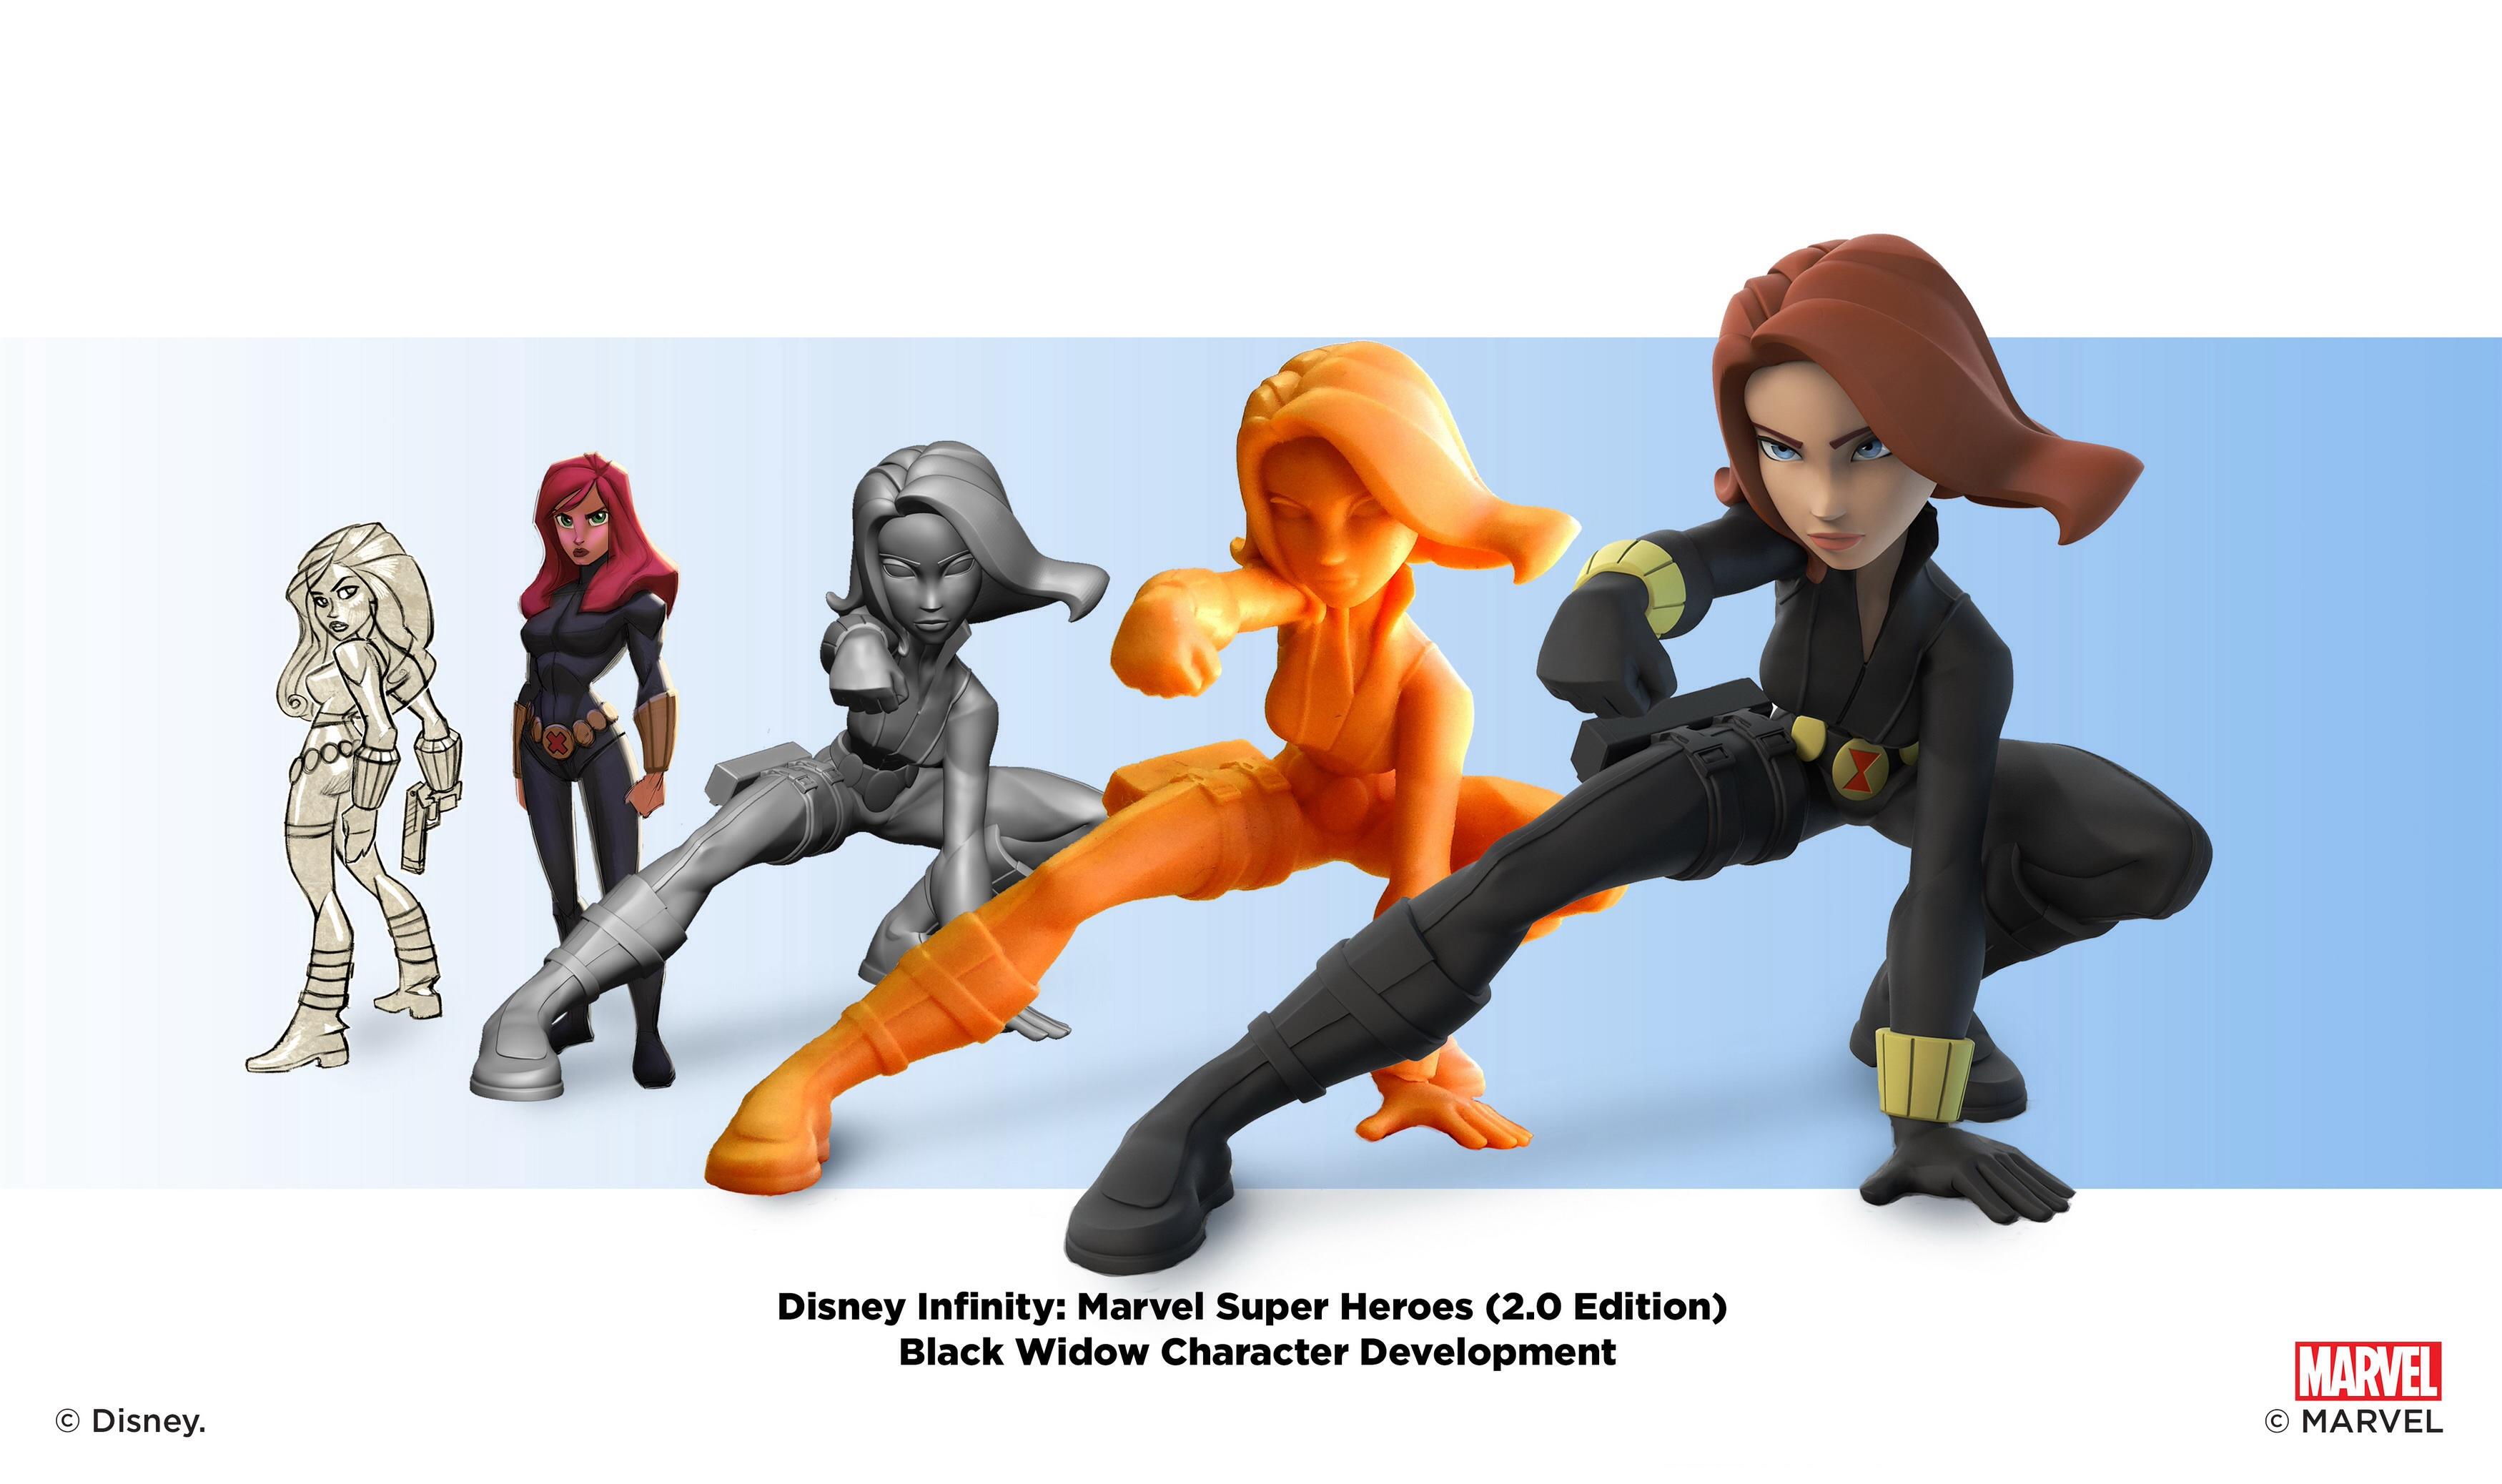 Disney Infinity 2.0 Peter Pan The Disney Infinity 2.0